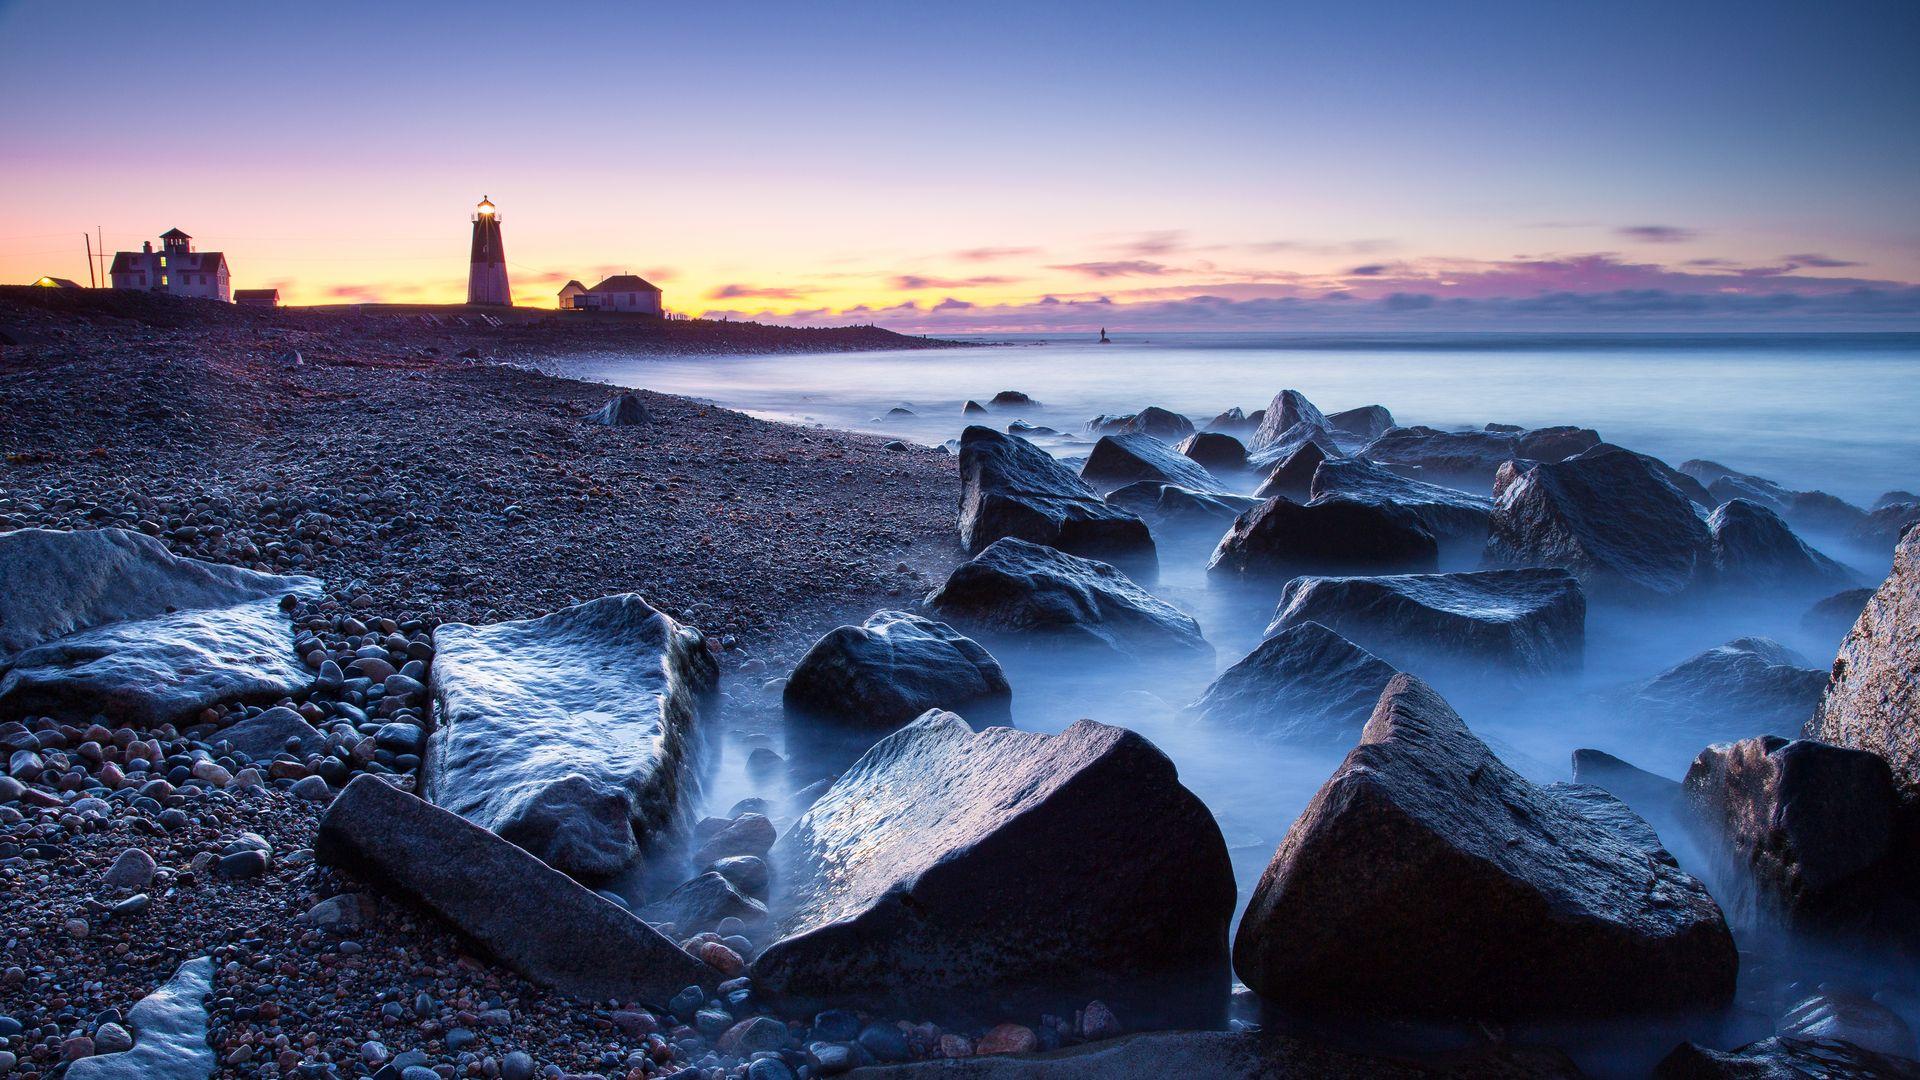 Beautiful Lighthouse Above A Mist Rocky Shore Hd Desktop Background Wallpaper Free